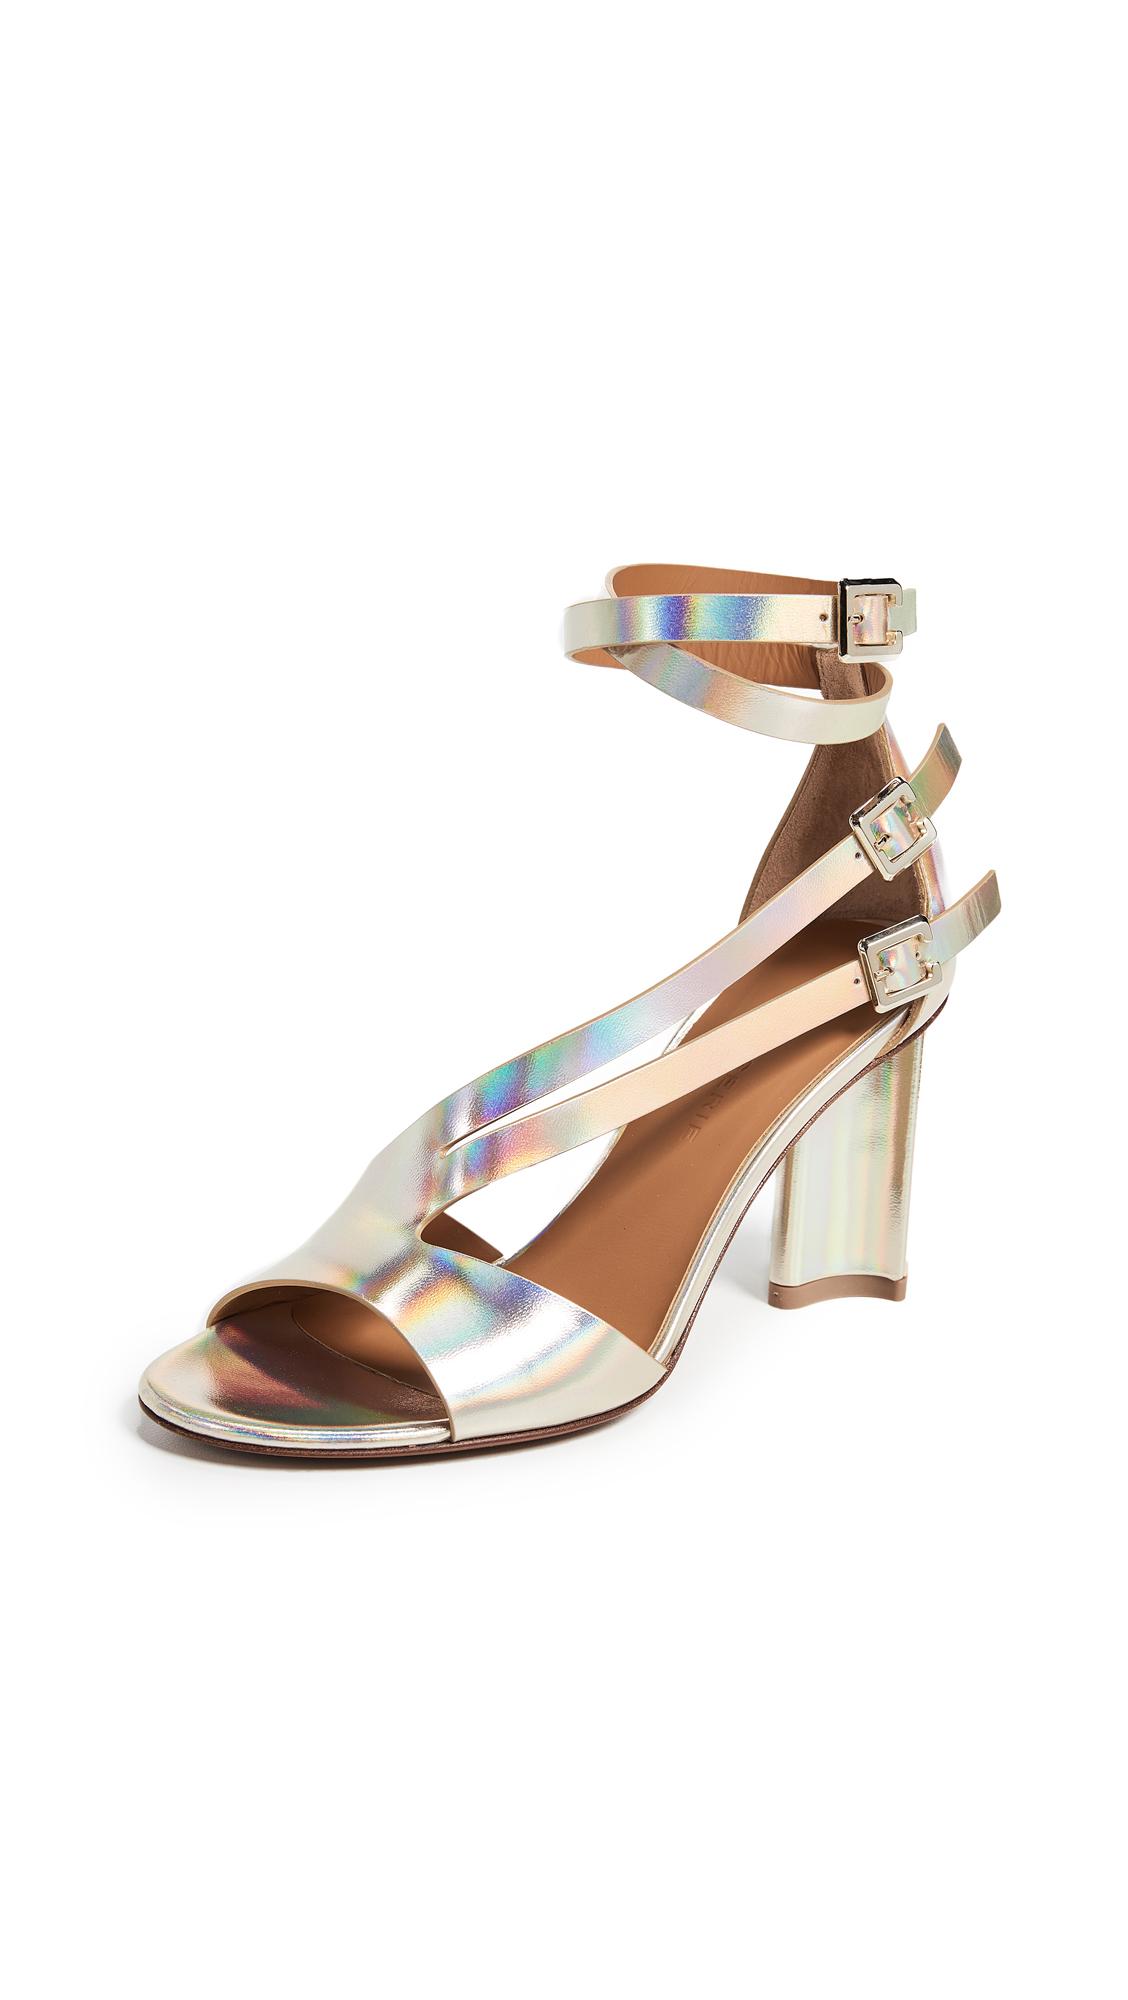 Robert Clergerie Ardent Sandals - Platinum